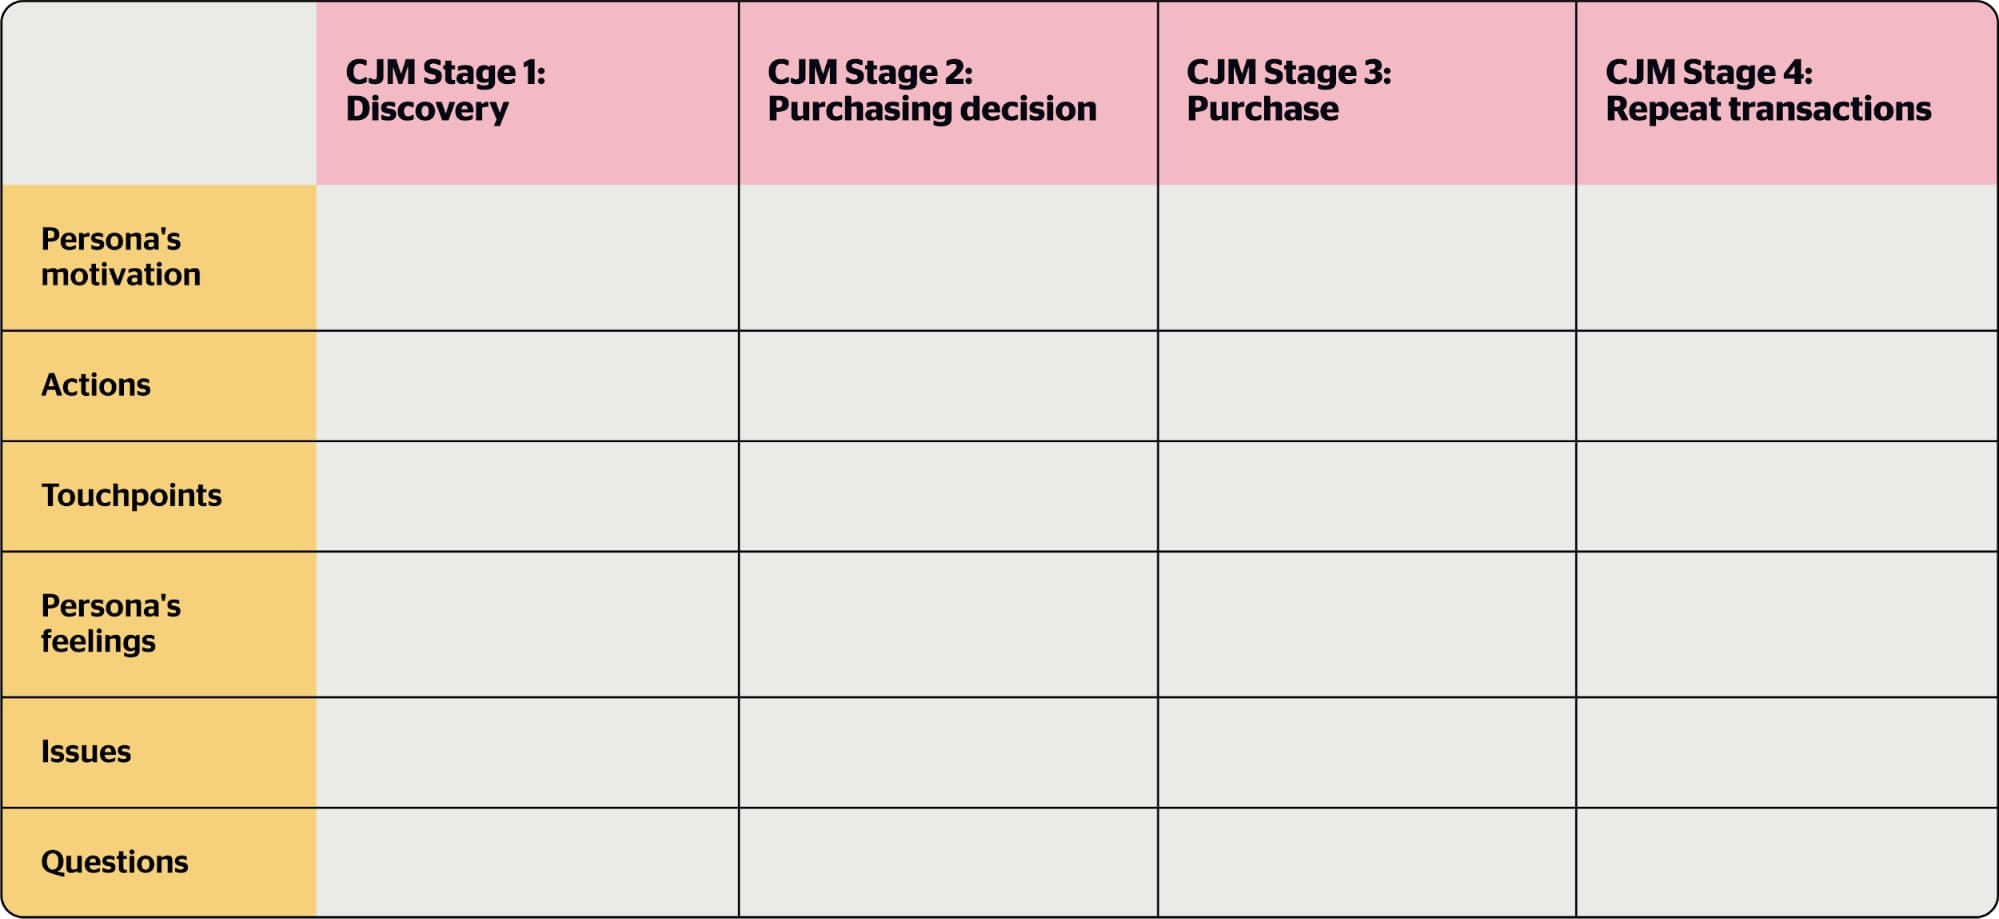 The CJM question plan